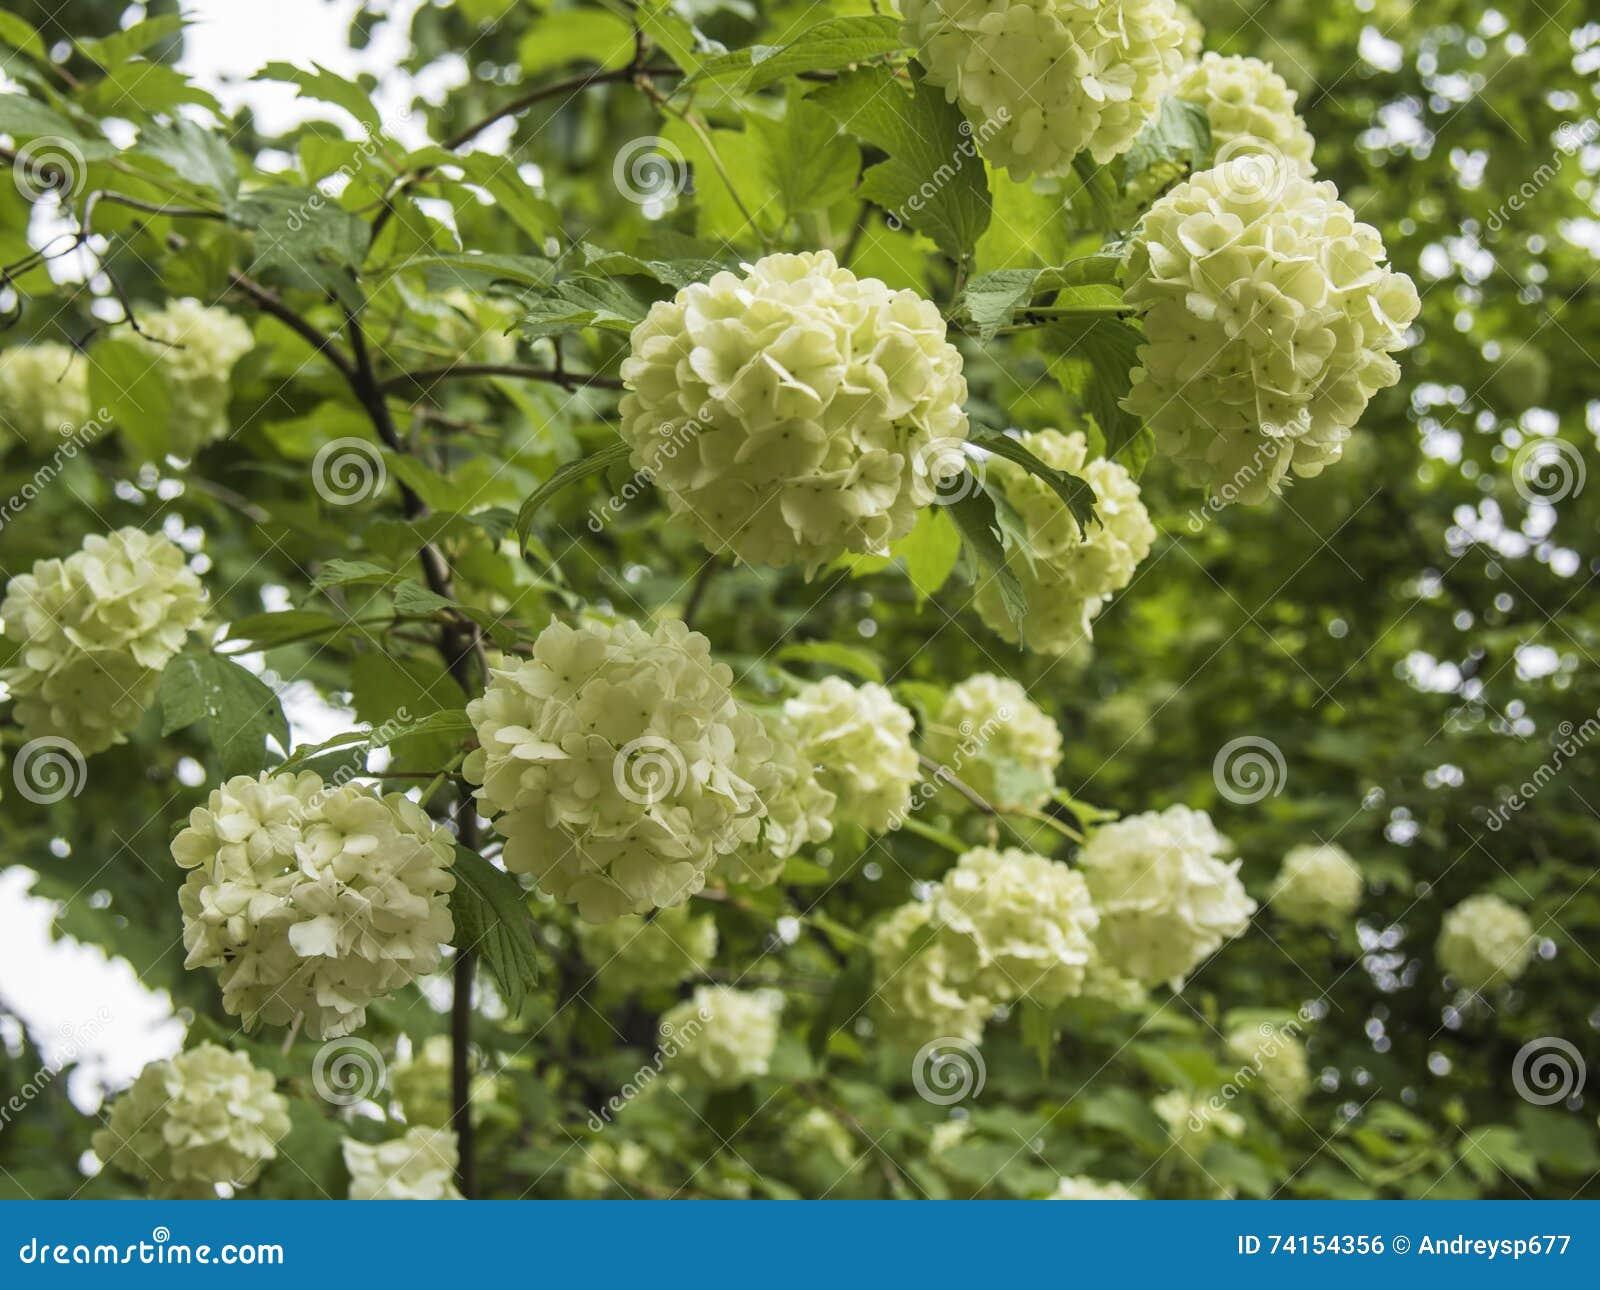 White flower balls of fragrant viburnum stock photo image of green download comp mightylinksfo